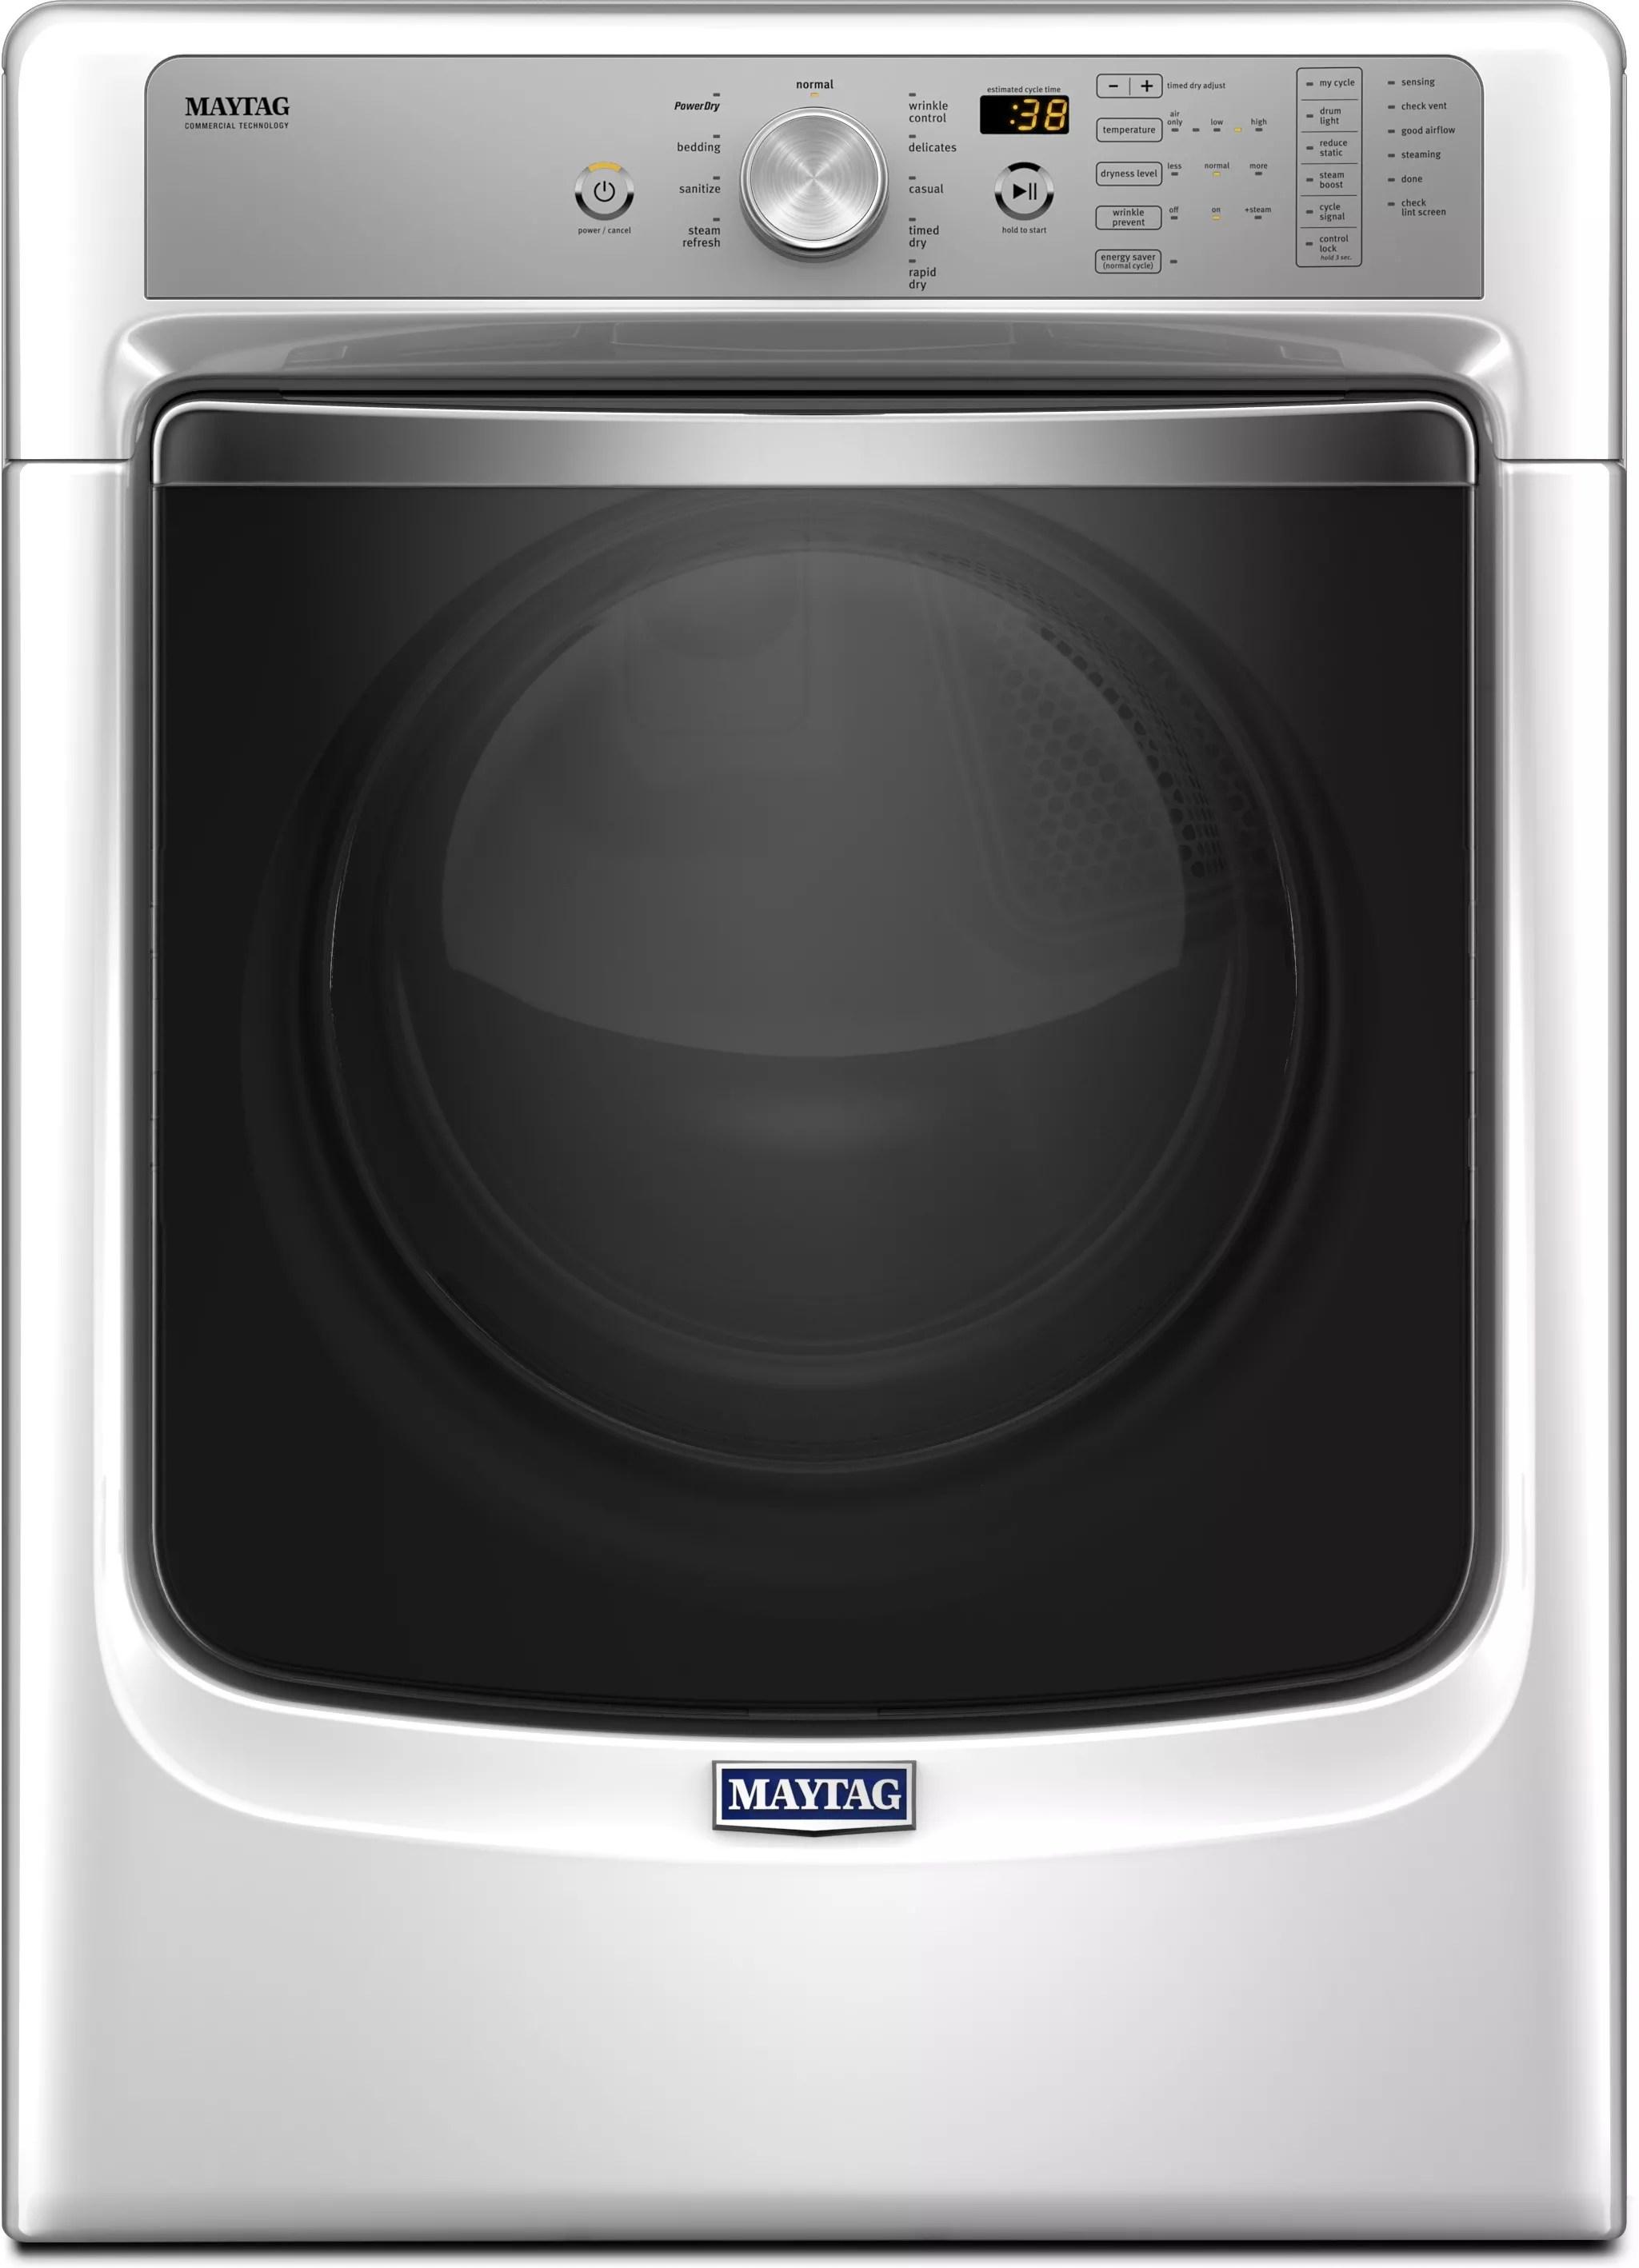 maytag kitchen ranges 4 stool island mgd8200fw 27 inch 7.4 cu. ft. gas dryer with steam ...